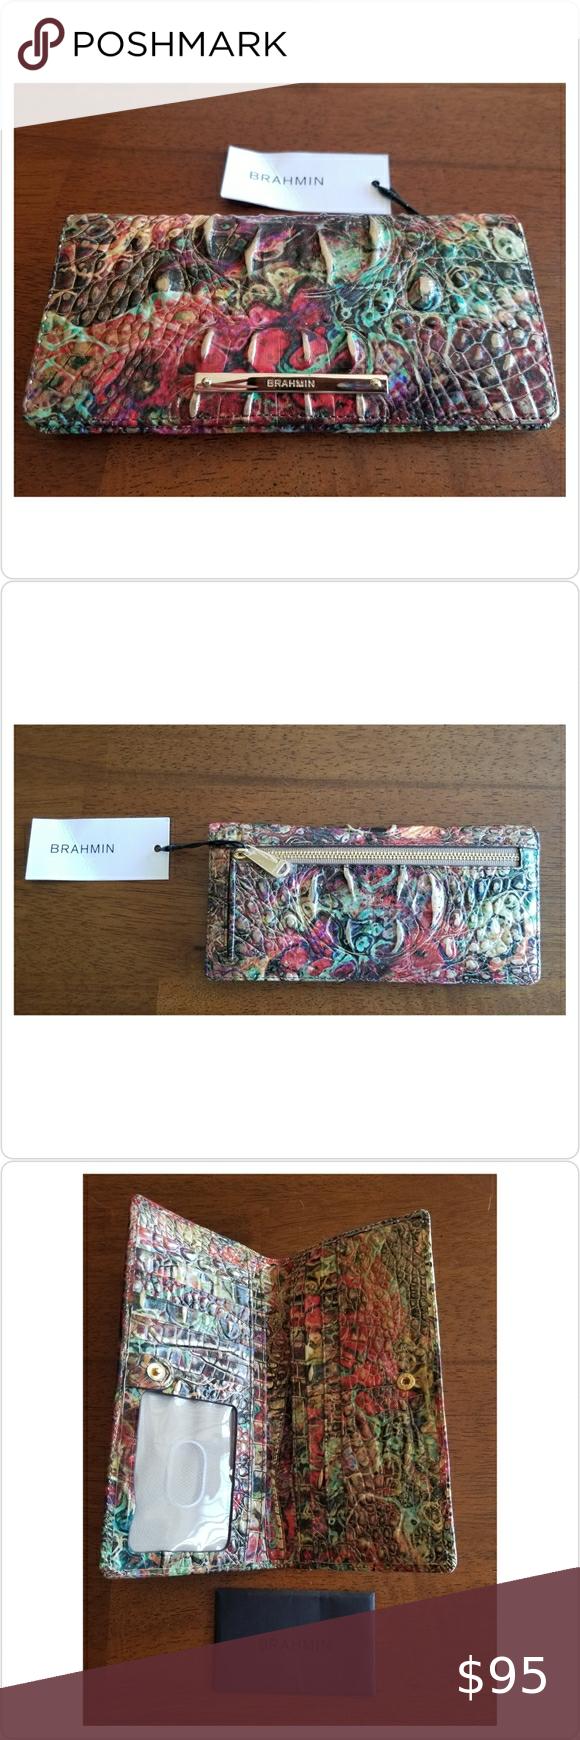 New Brahmin AMMOLITE Ady Melbourne Wallet